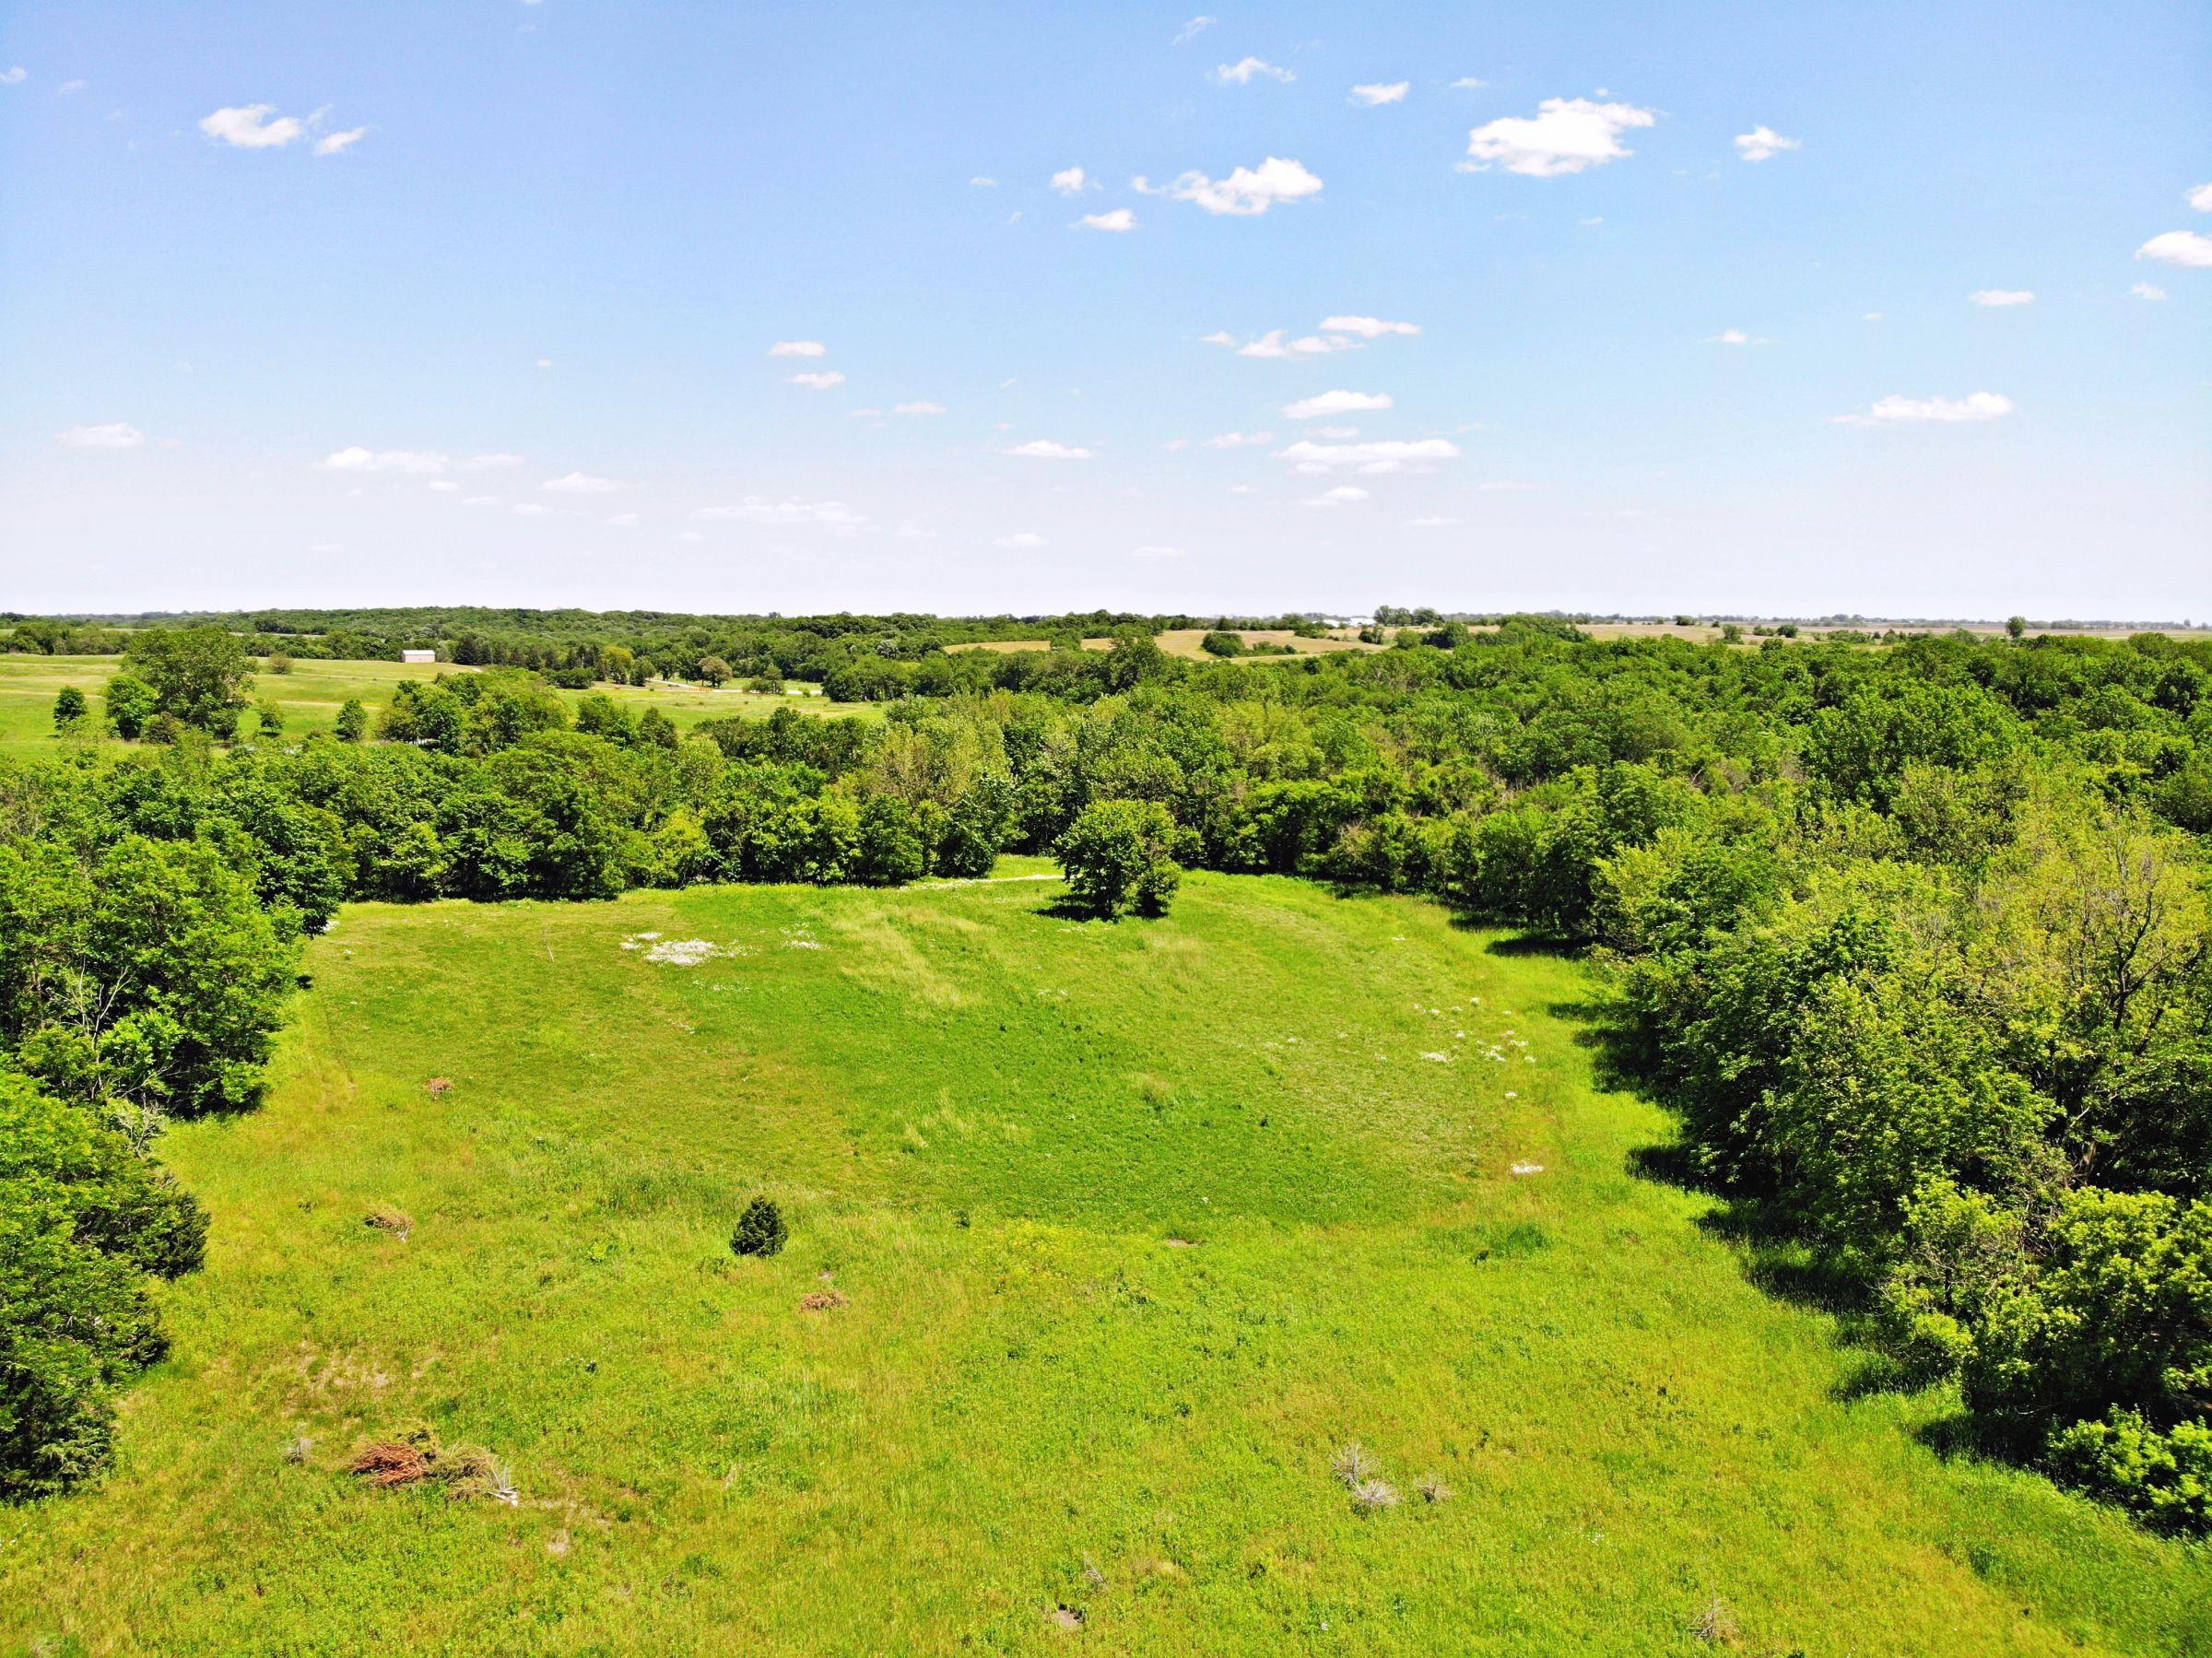 14497-78-acres-clarke-co-ia-1-2019-06-12-160113.jpg